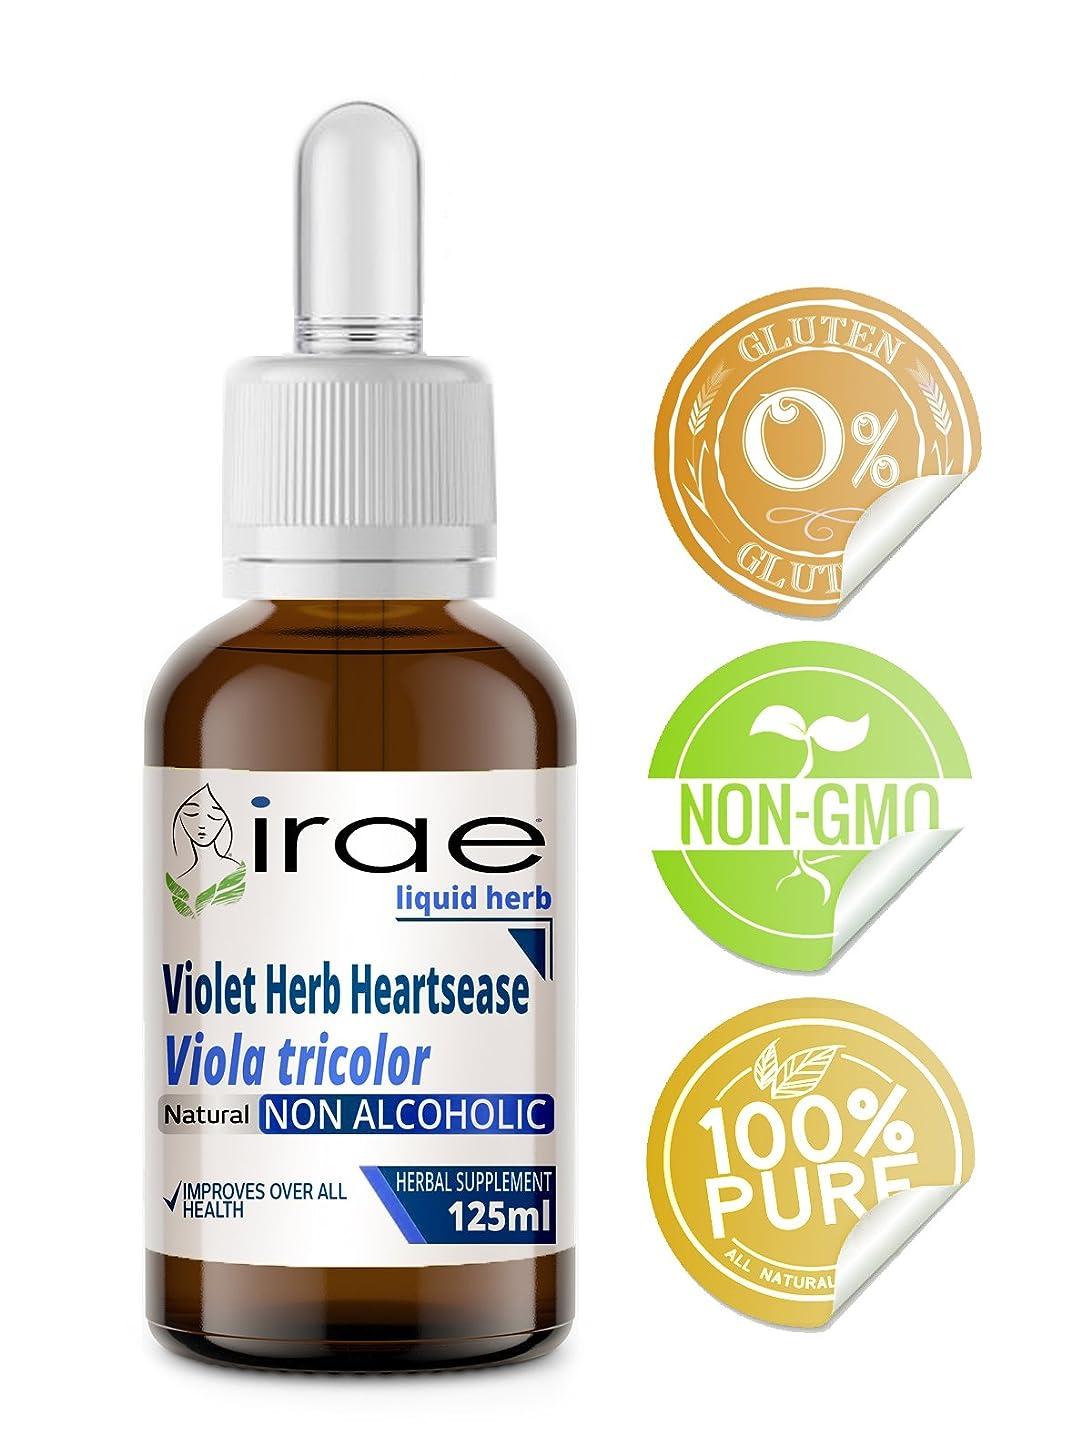 Organic Violet Herb Heartsease Viola tricolor 1:1 Liquid Herb Non Alcoholic 125ml